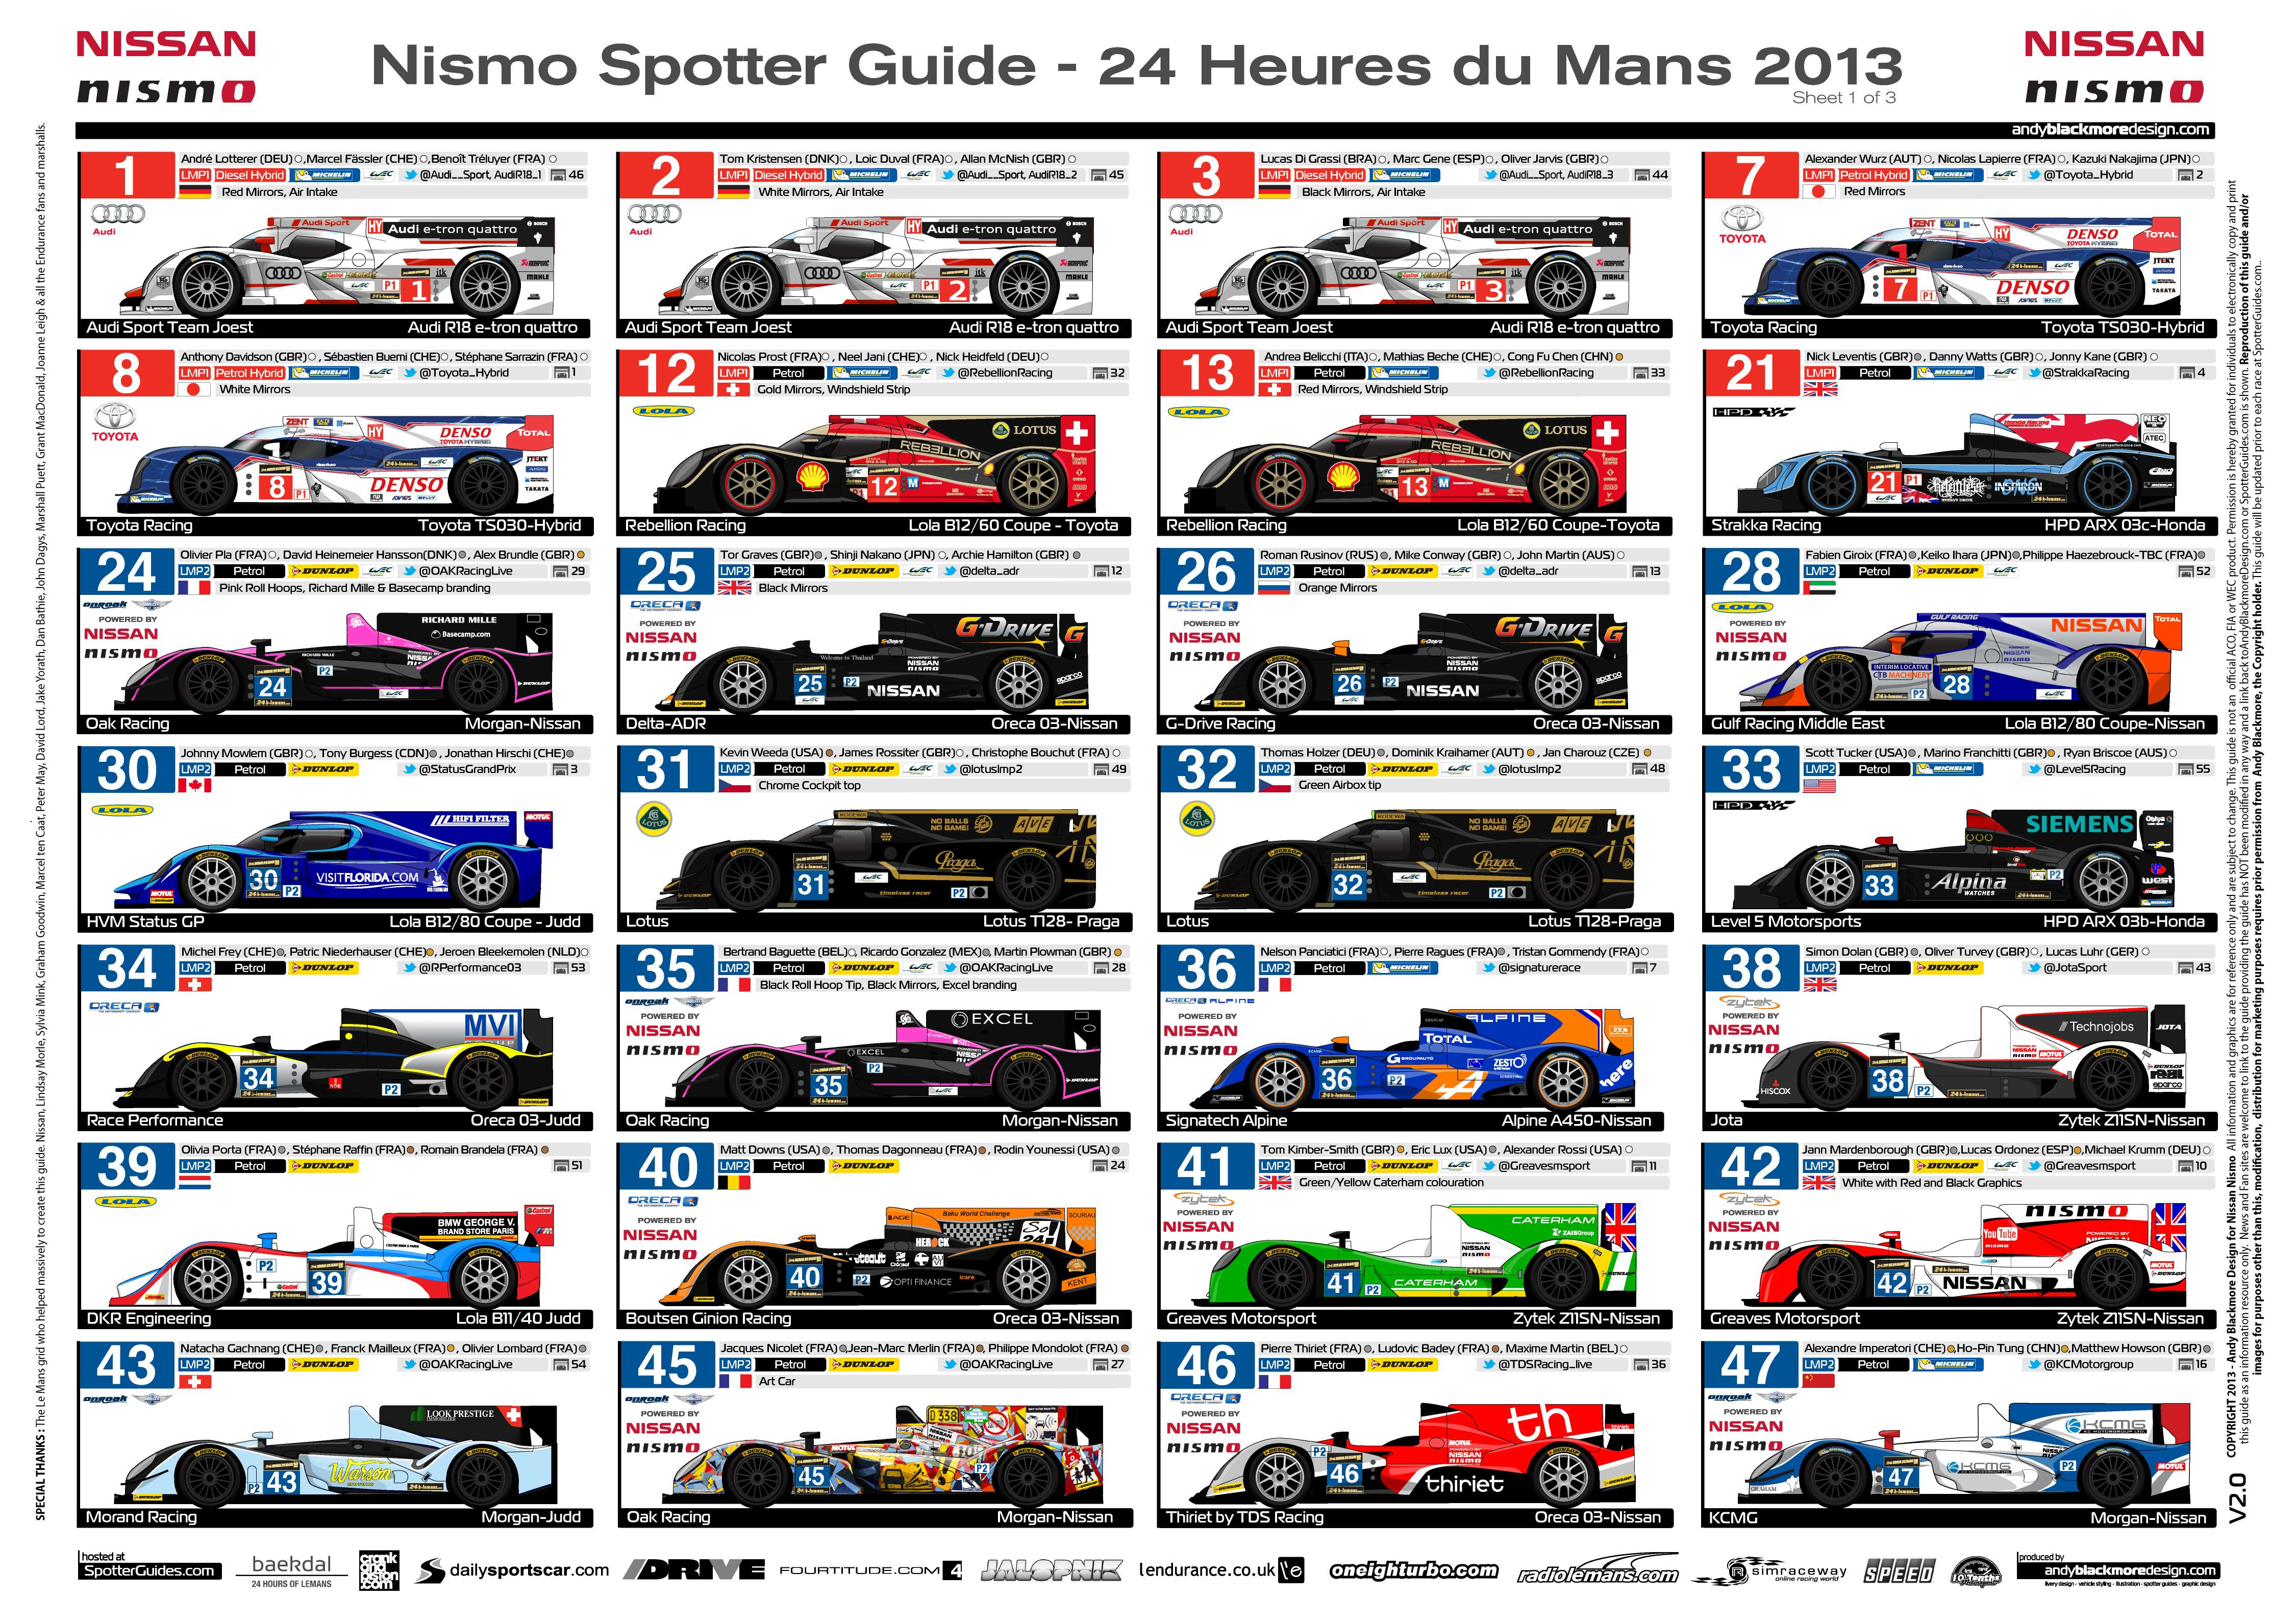 Le Mans 24 Hours 2013 Spotter Guide LMP1 LMP2